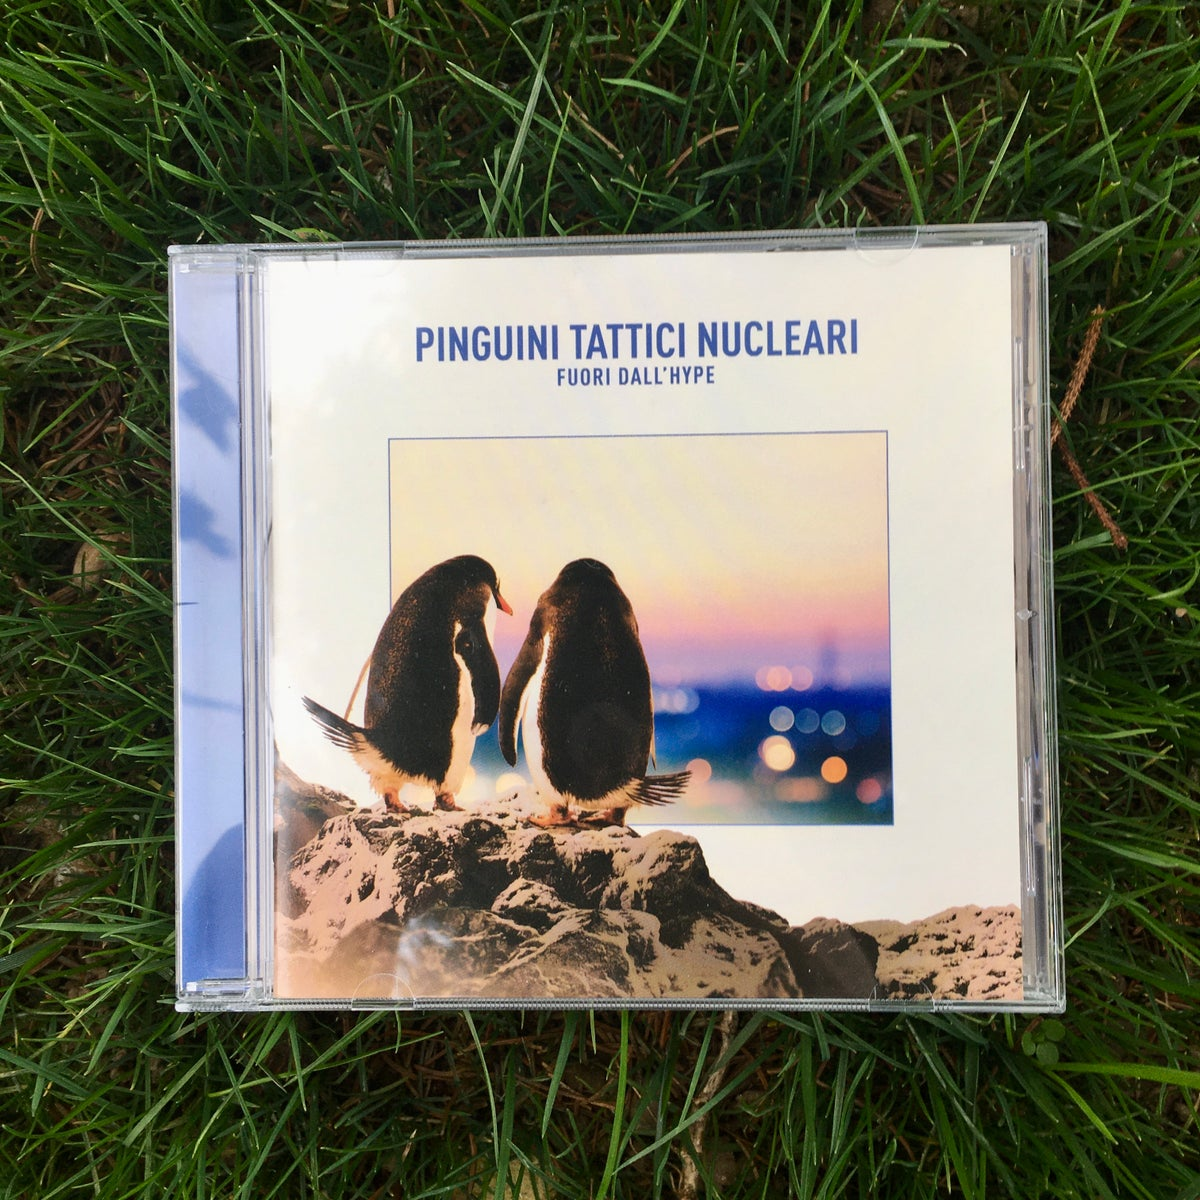 Image of Pinguini Tattici Nucleari - Fuori dall'hype (CD autografato)